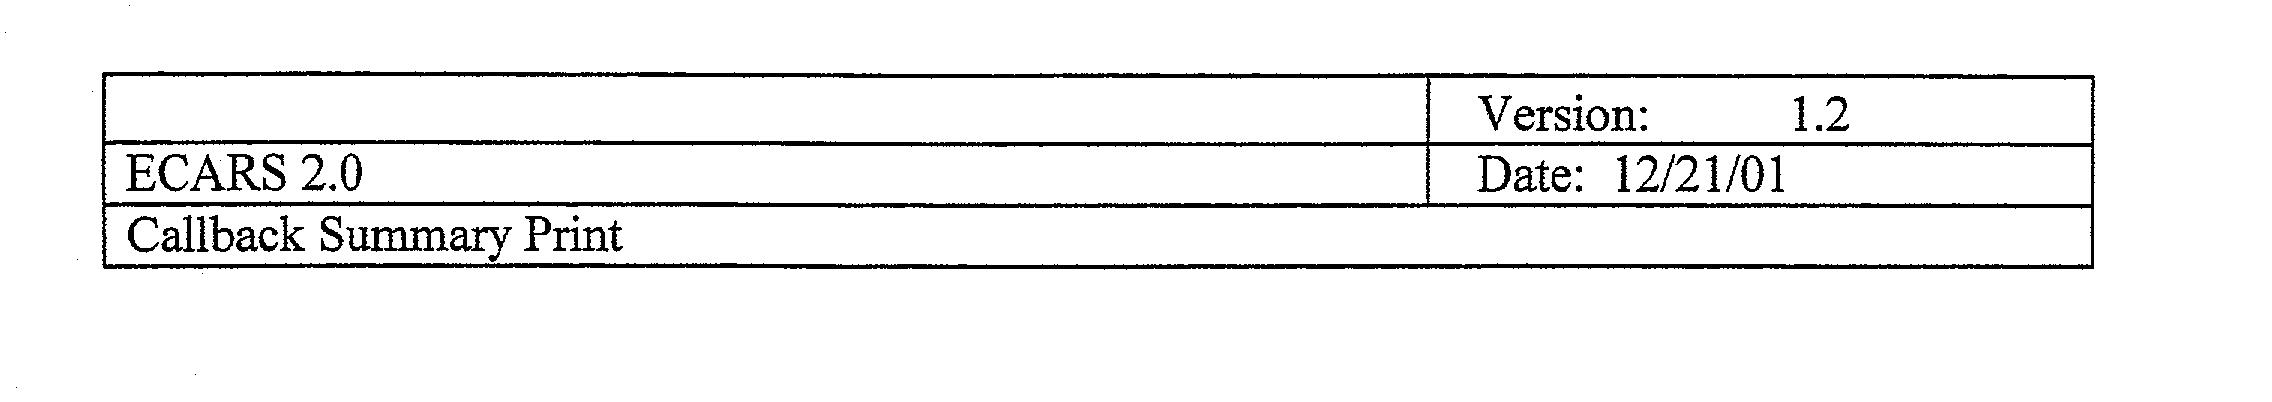 Figure US20030125992A1-20030703-P01462